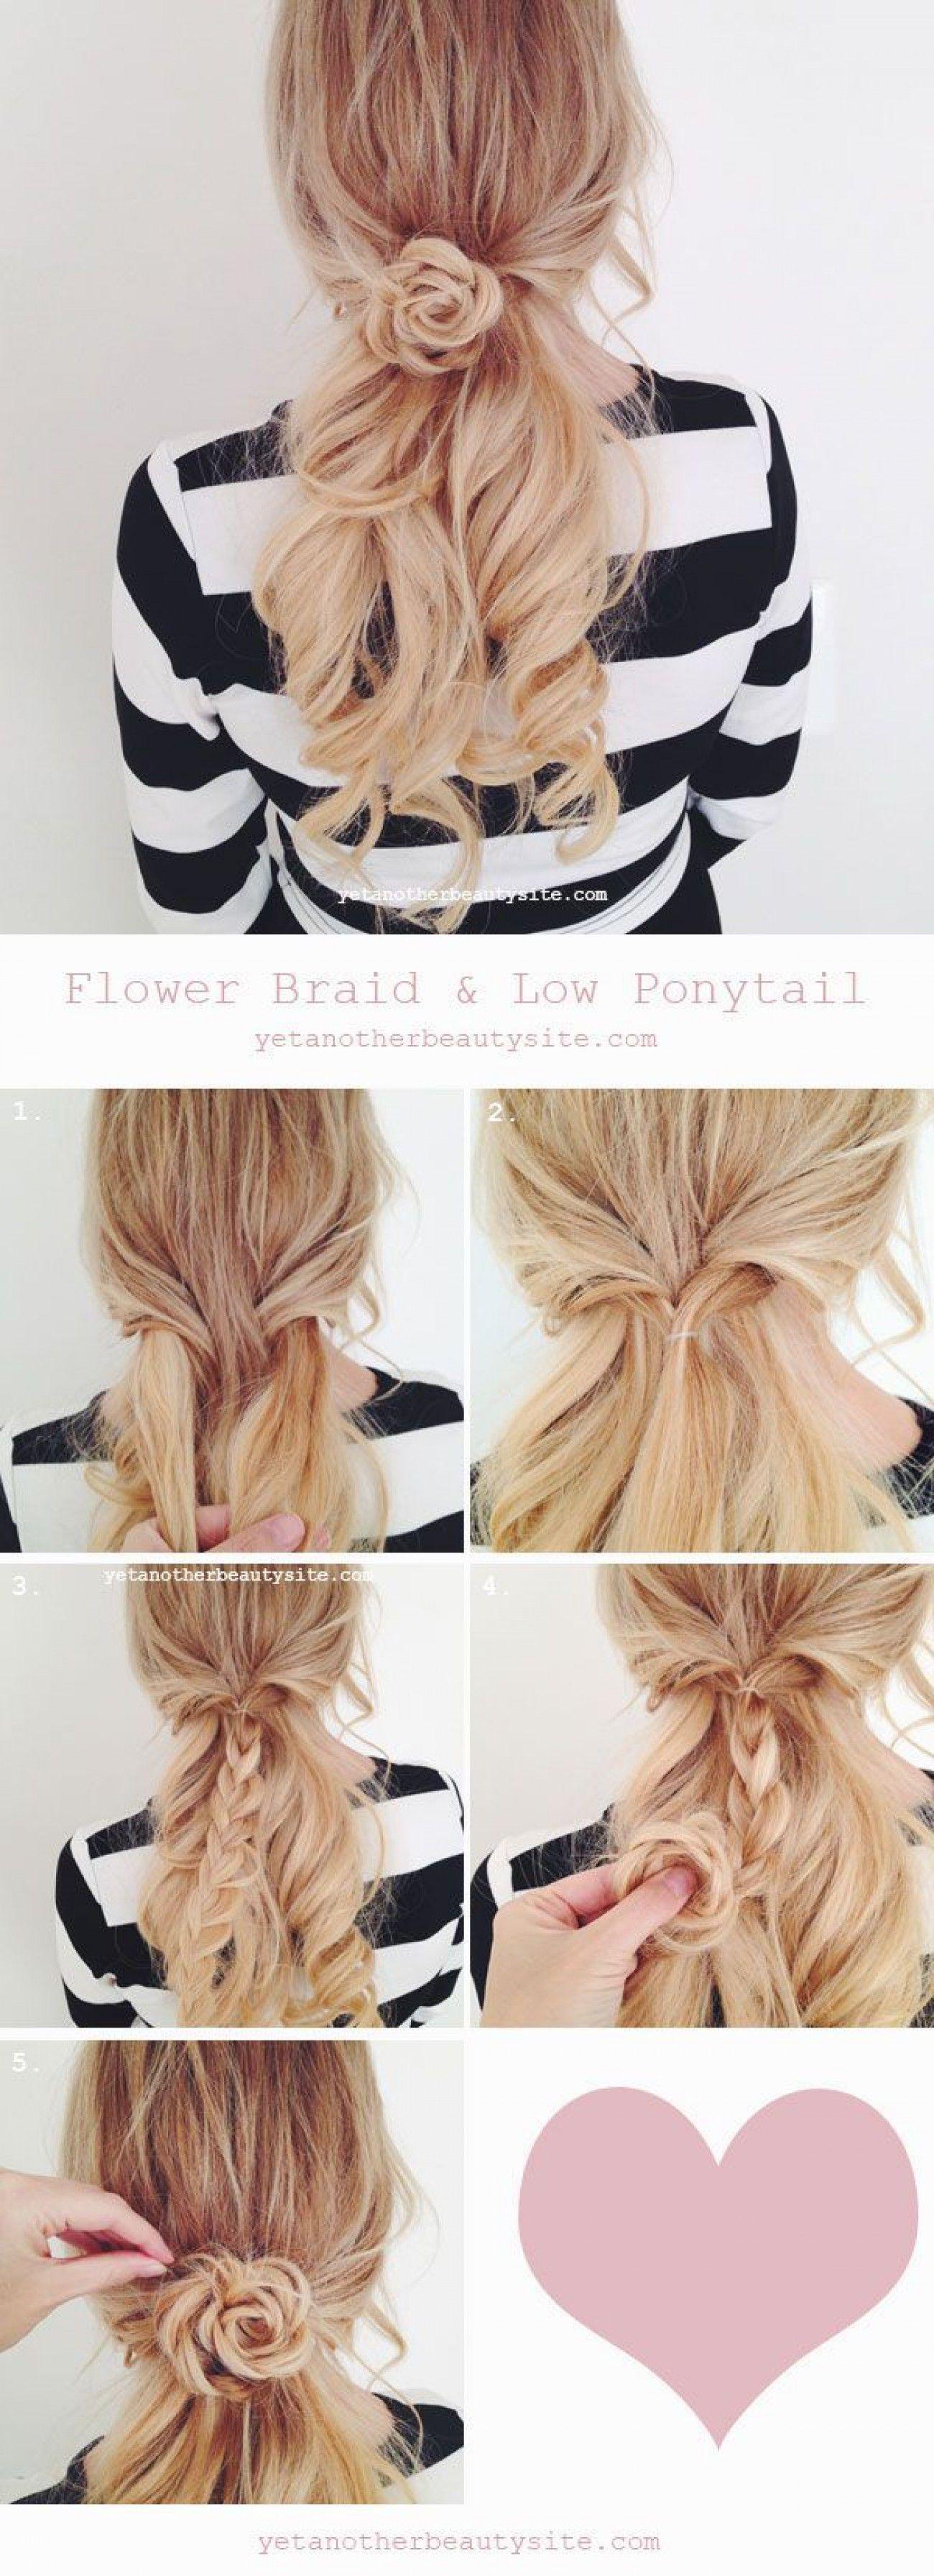 Flower braid haar hair kapsel hair pinterest flower hair